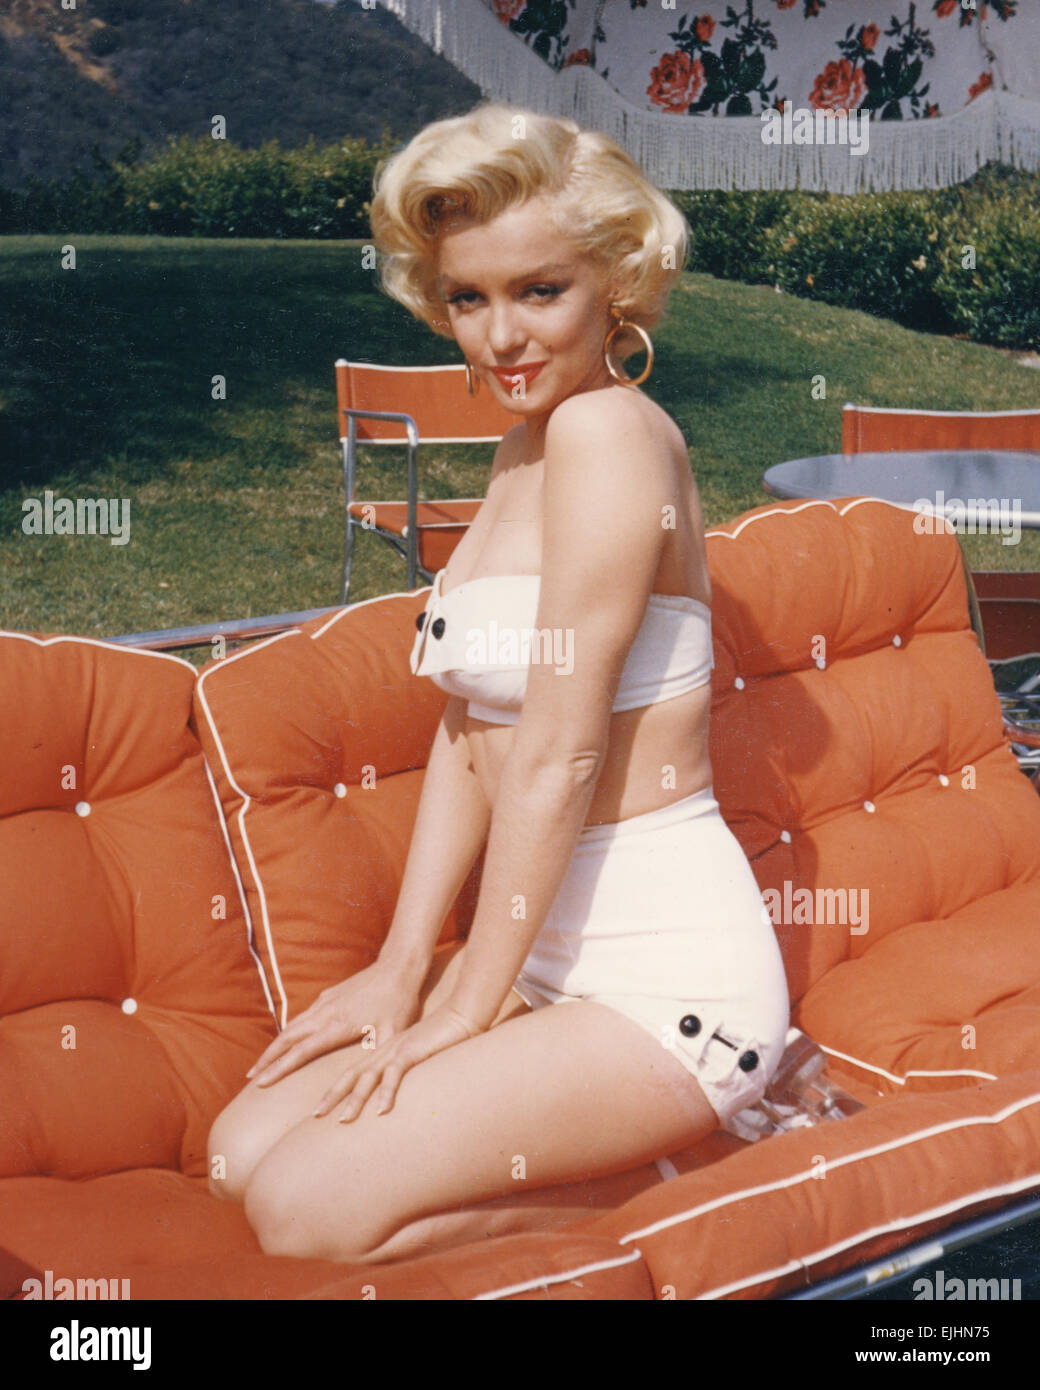 MARILYN MONROE (1926-1962) US film actress - Stock Image